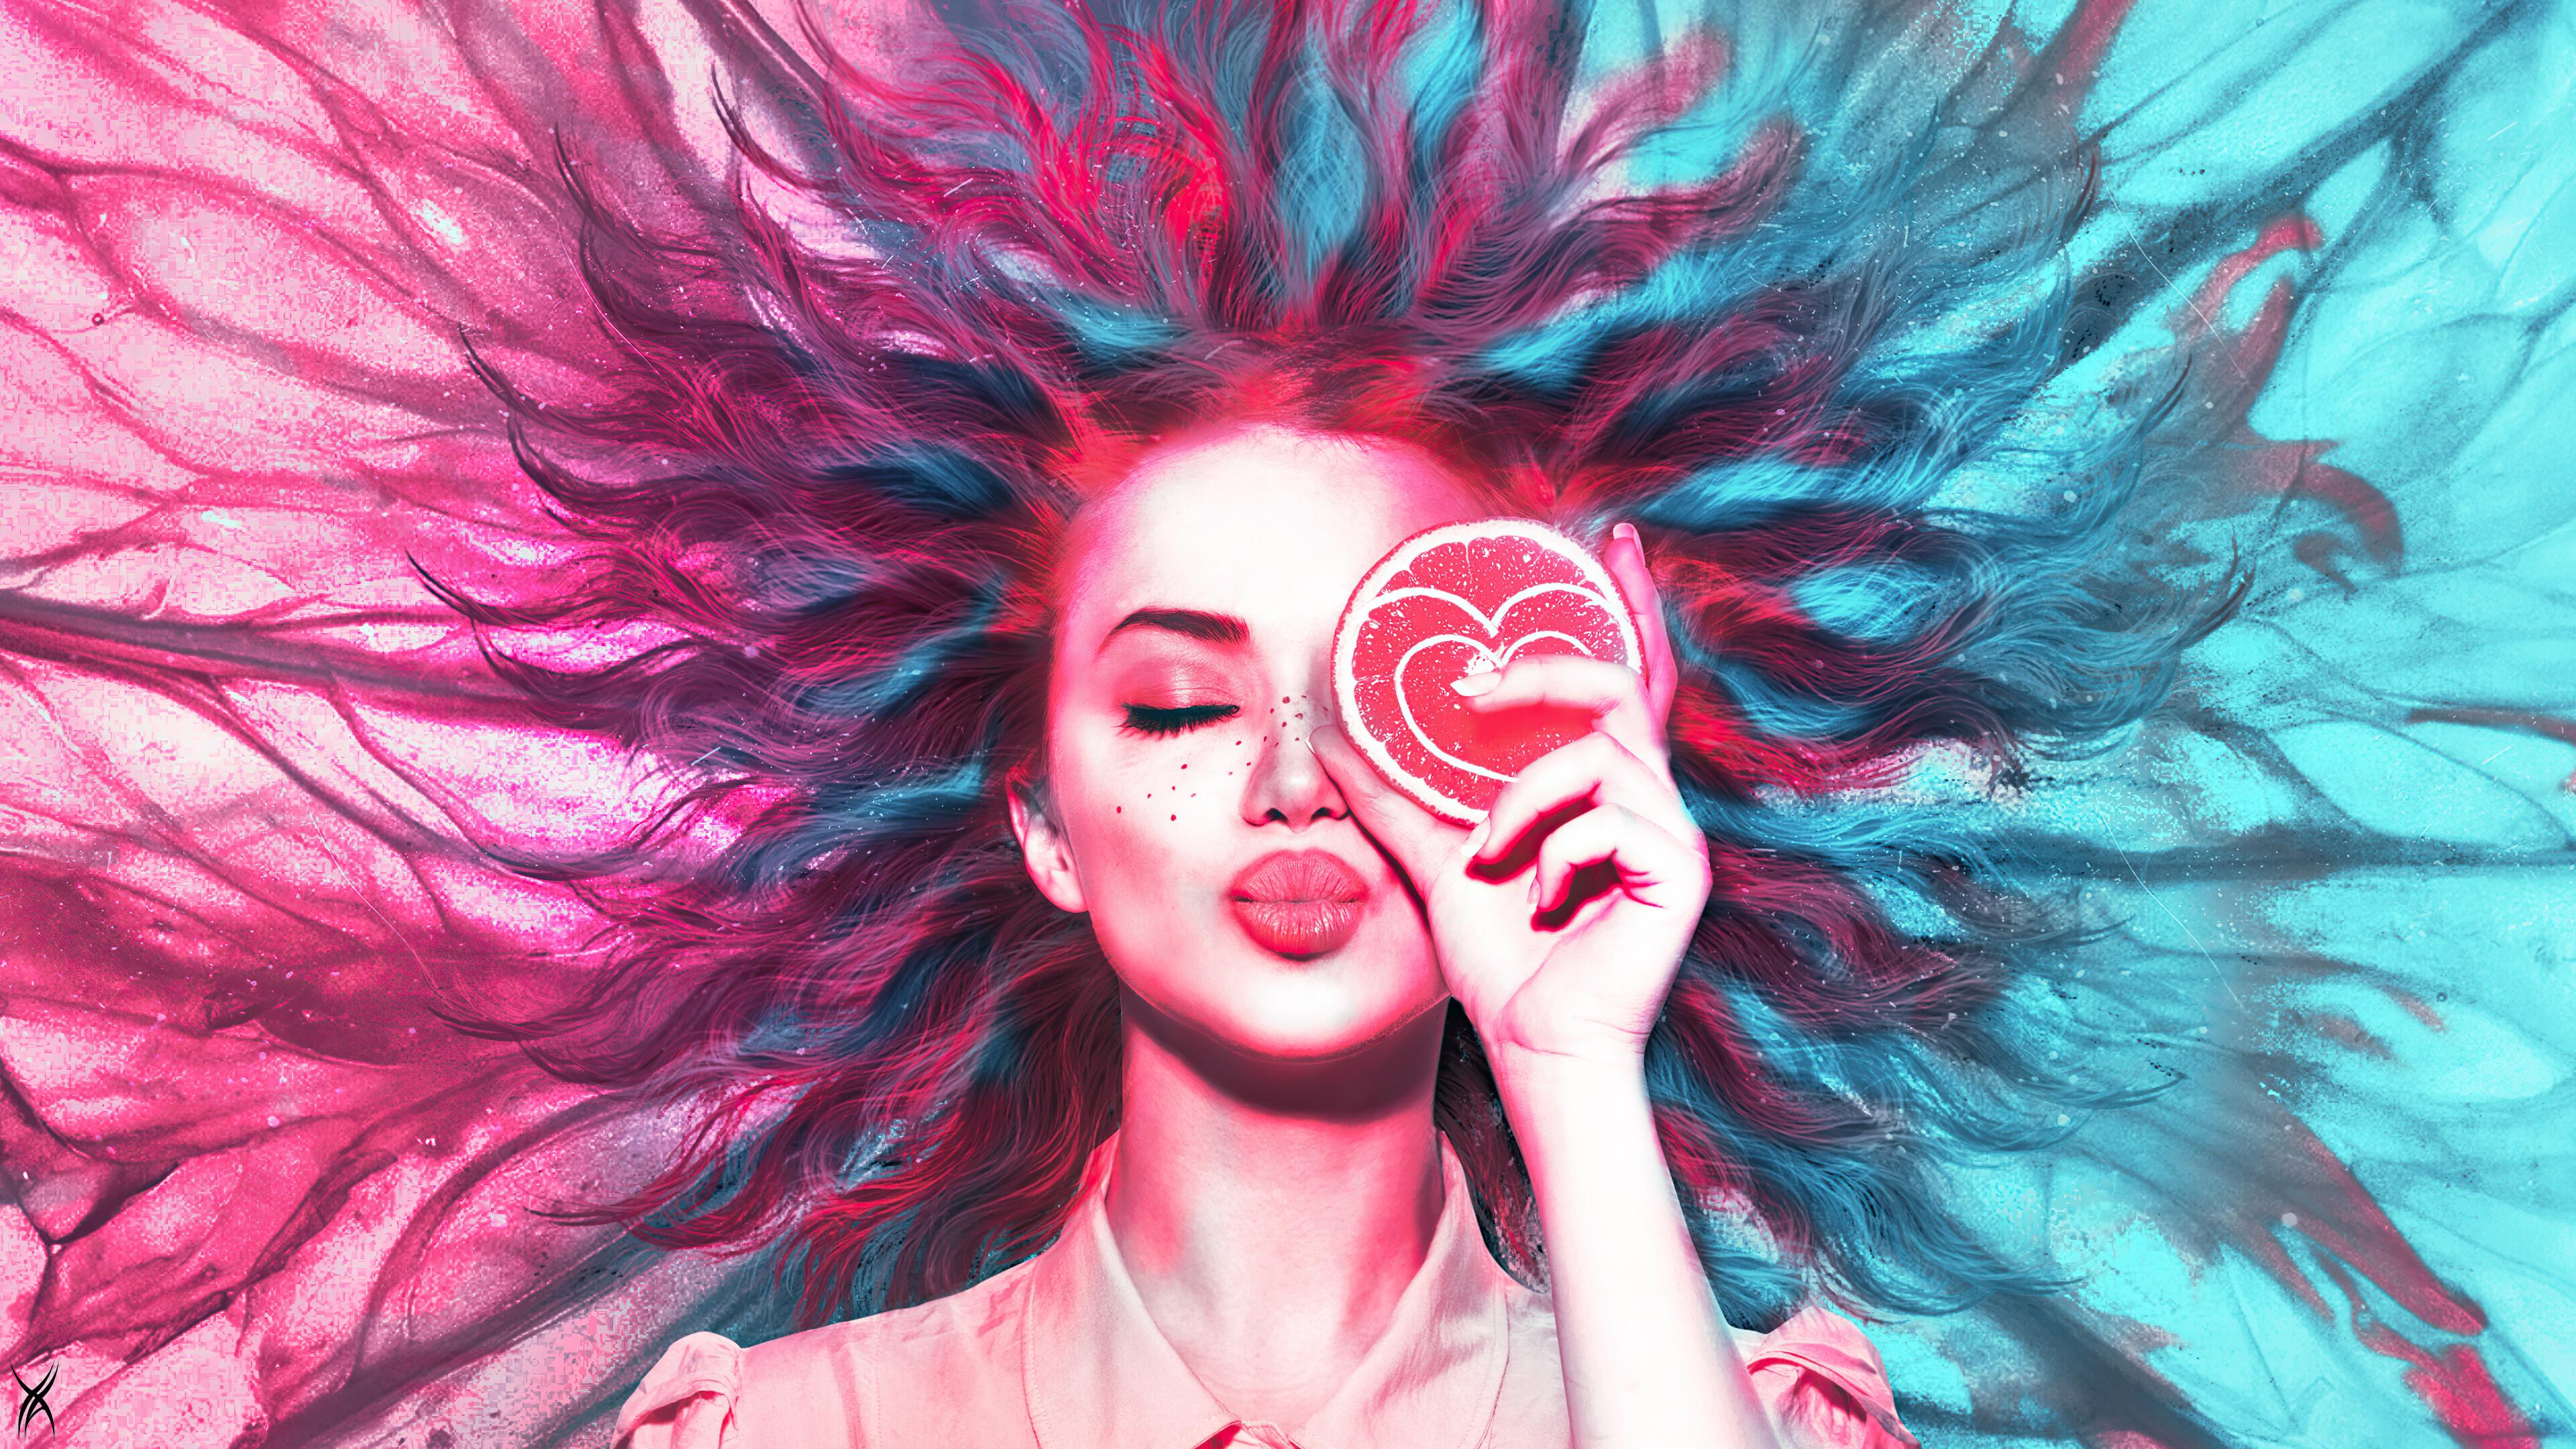 General 3840x2160 digital art artwork concept art love heart lips lipstick long hair pink blue women Photoshop lemons kissing illustration frontal view